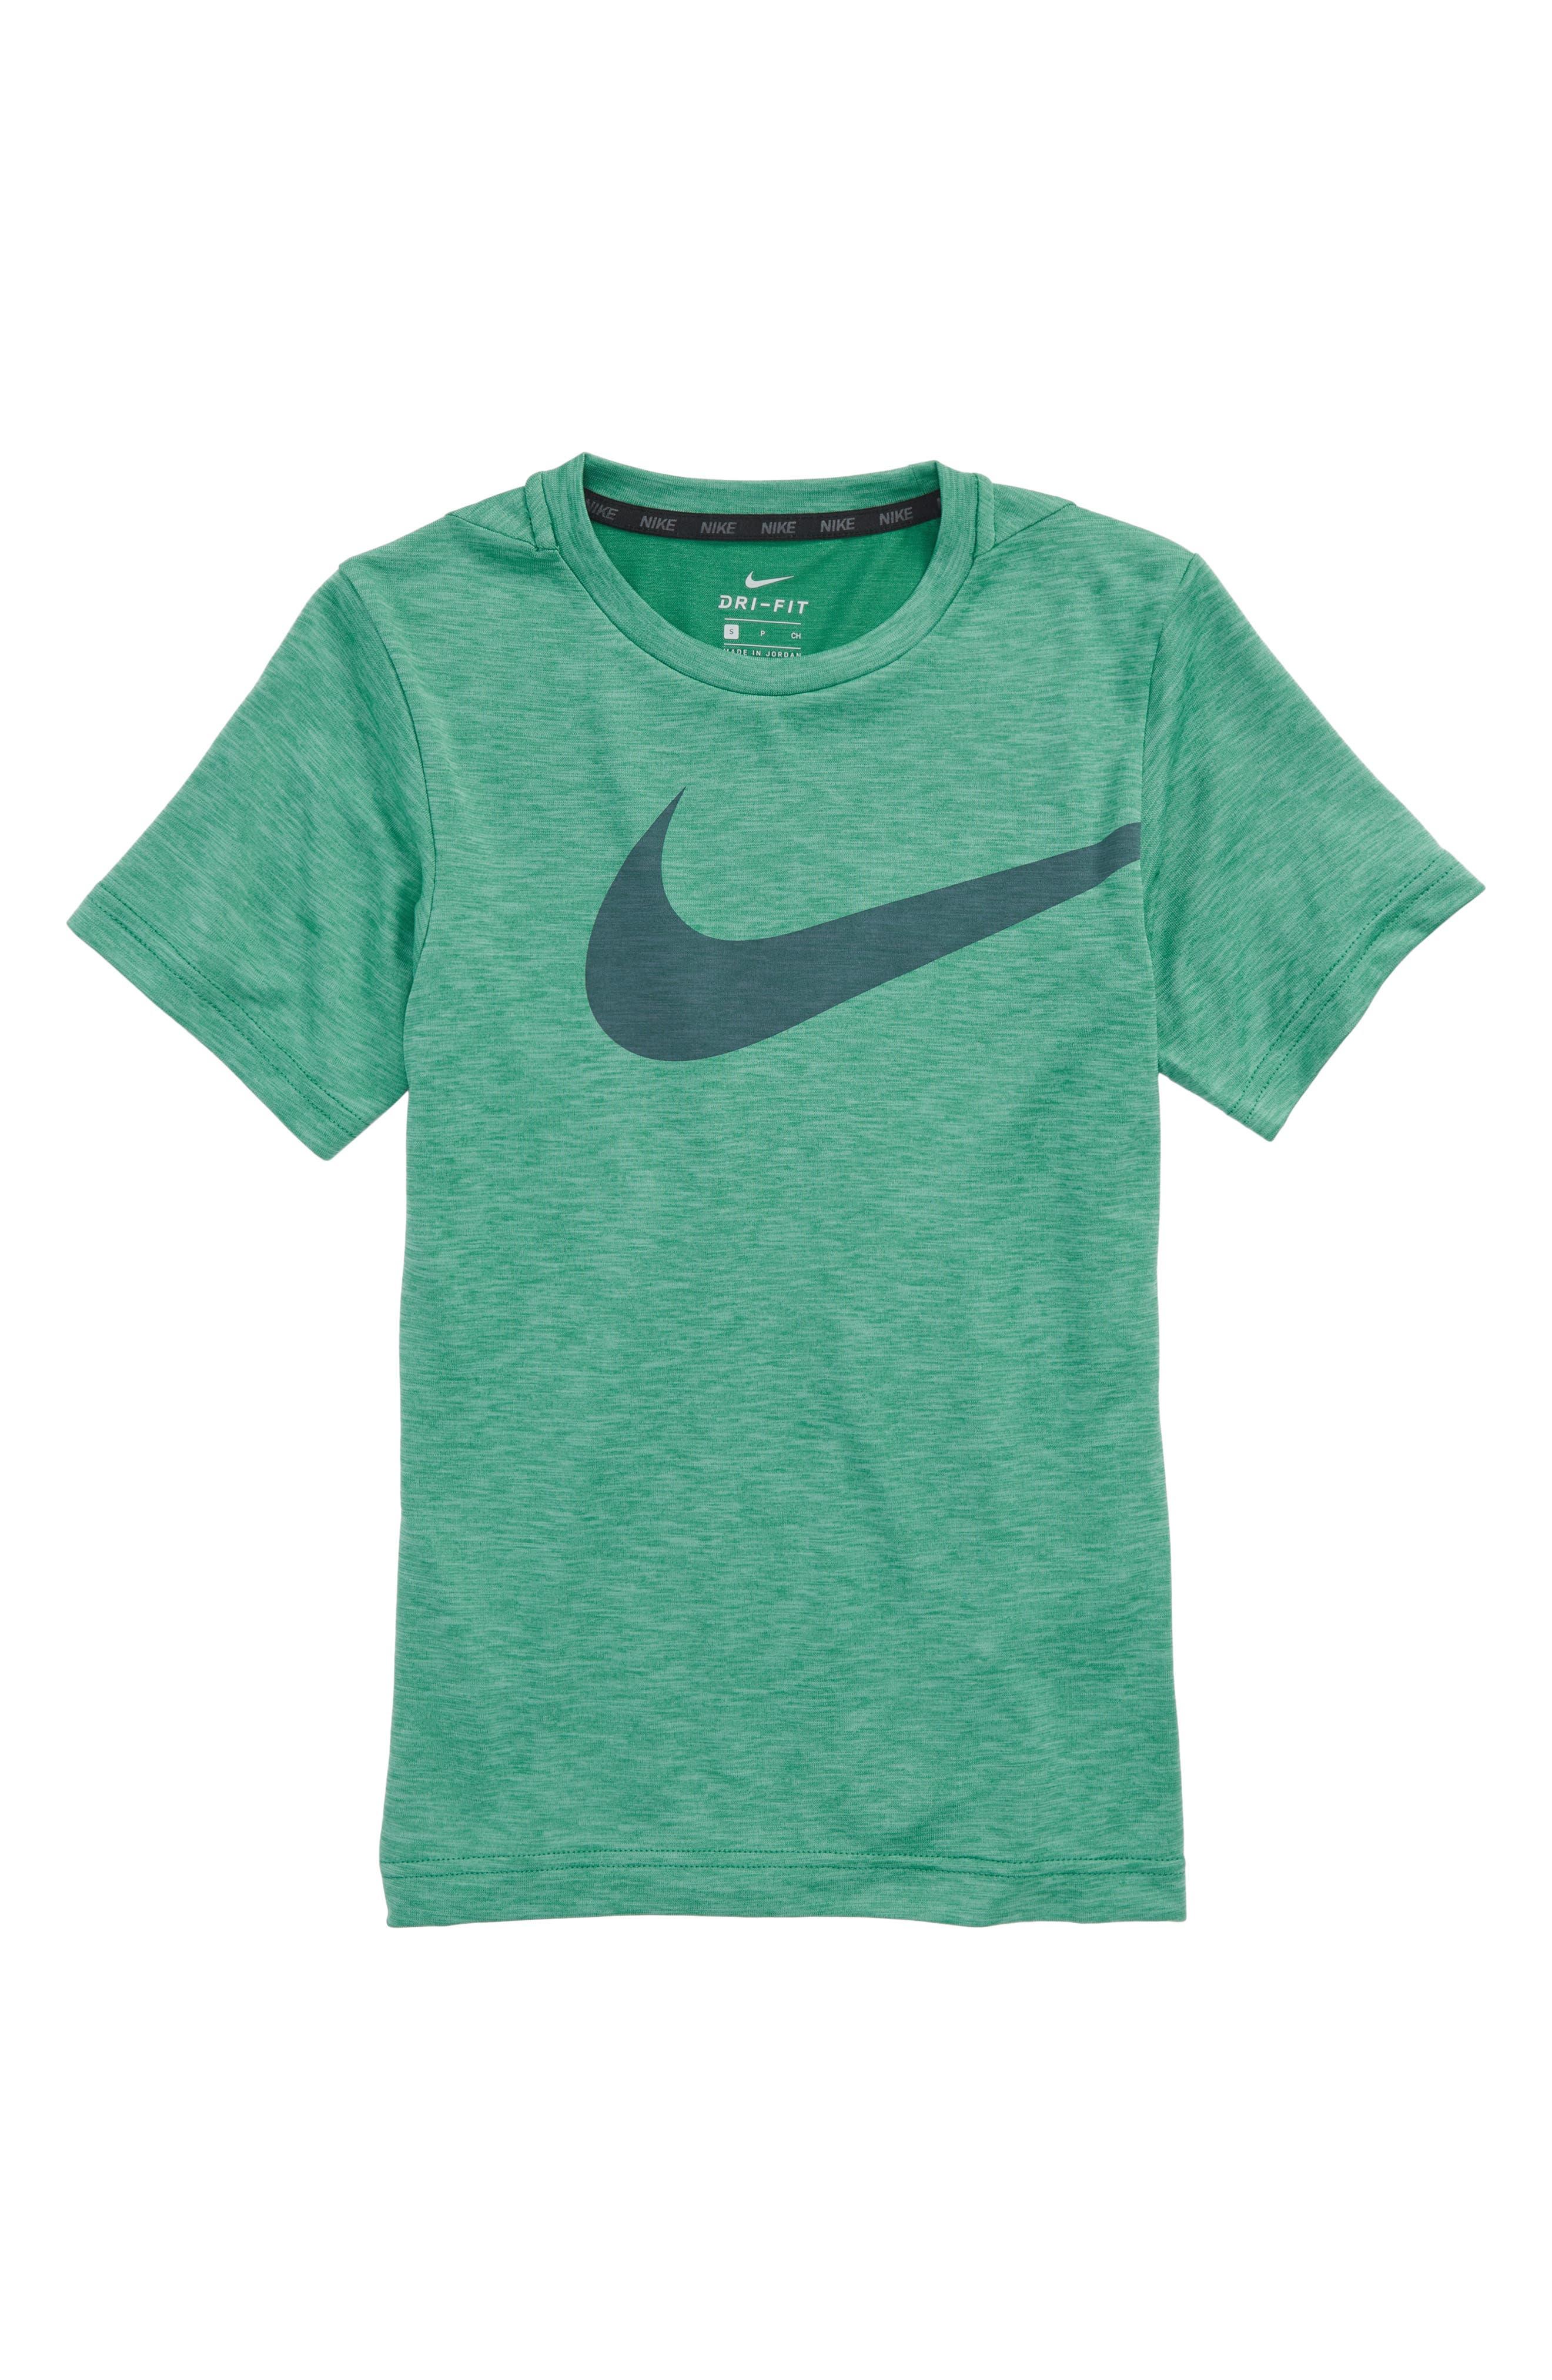 Breathe Dri-FIT T-Shirt,                         Main,                         color, Kinetic Green/ Green Noise